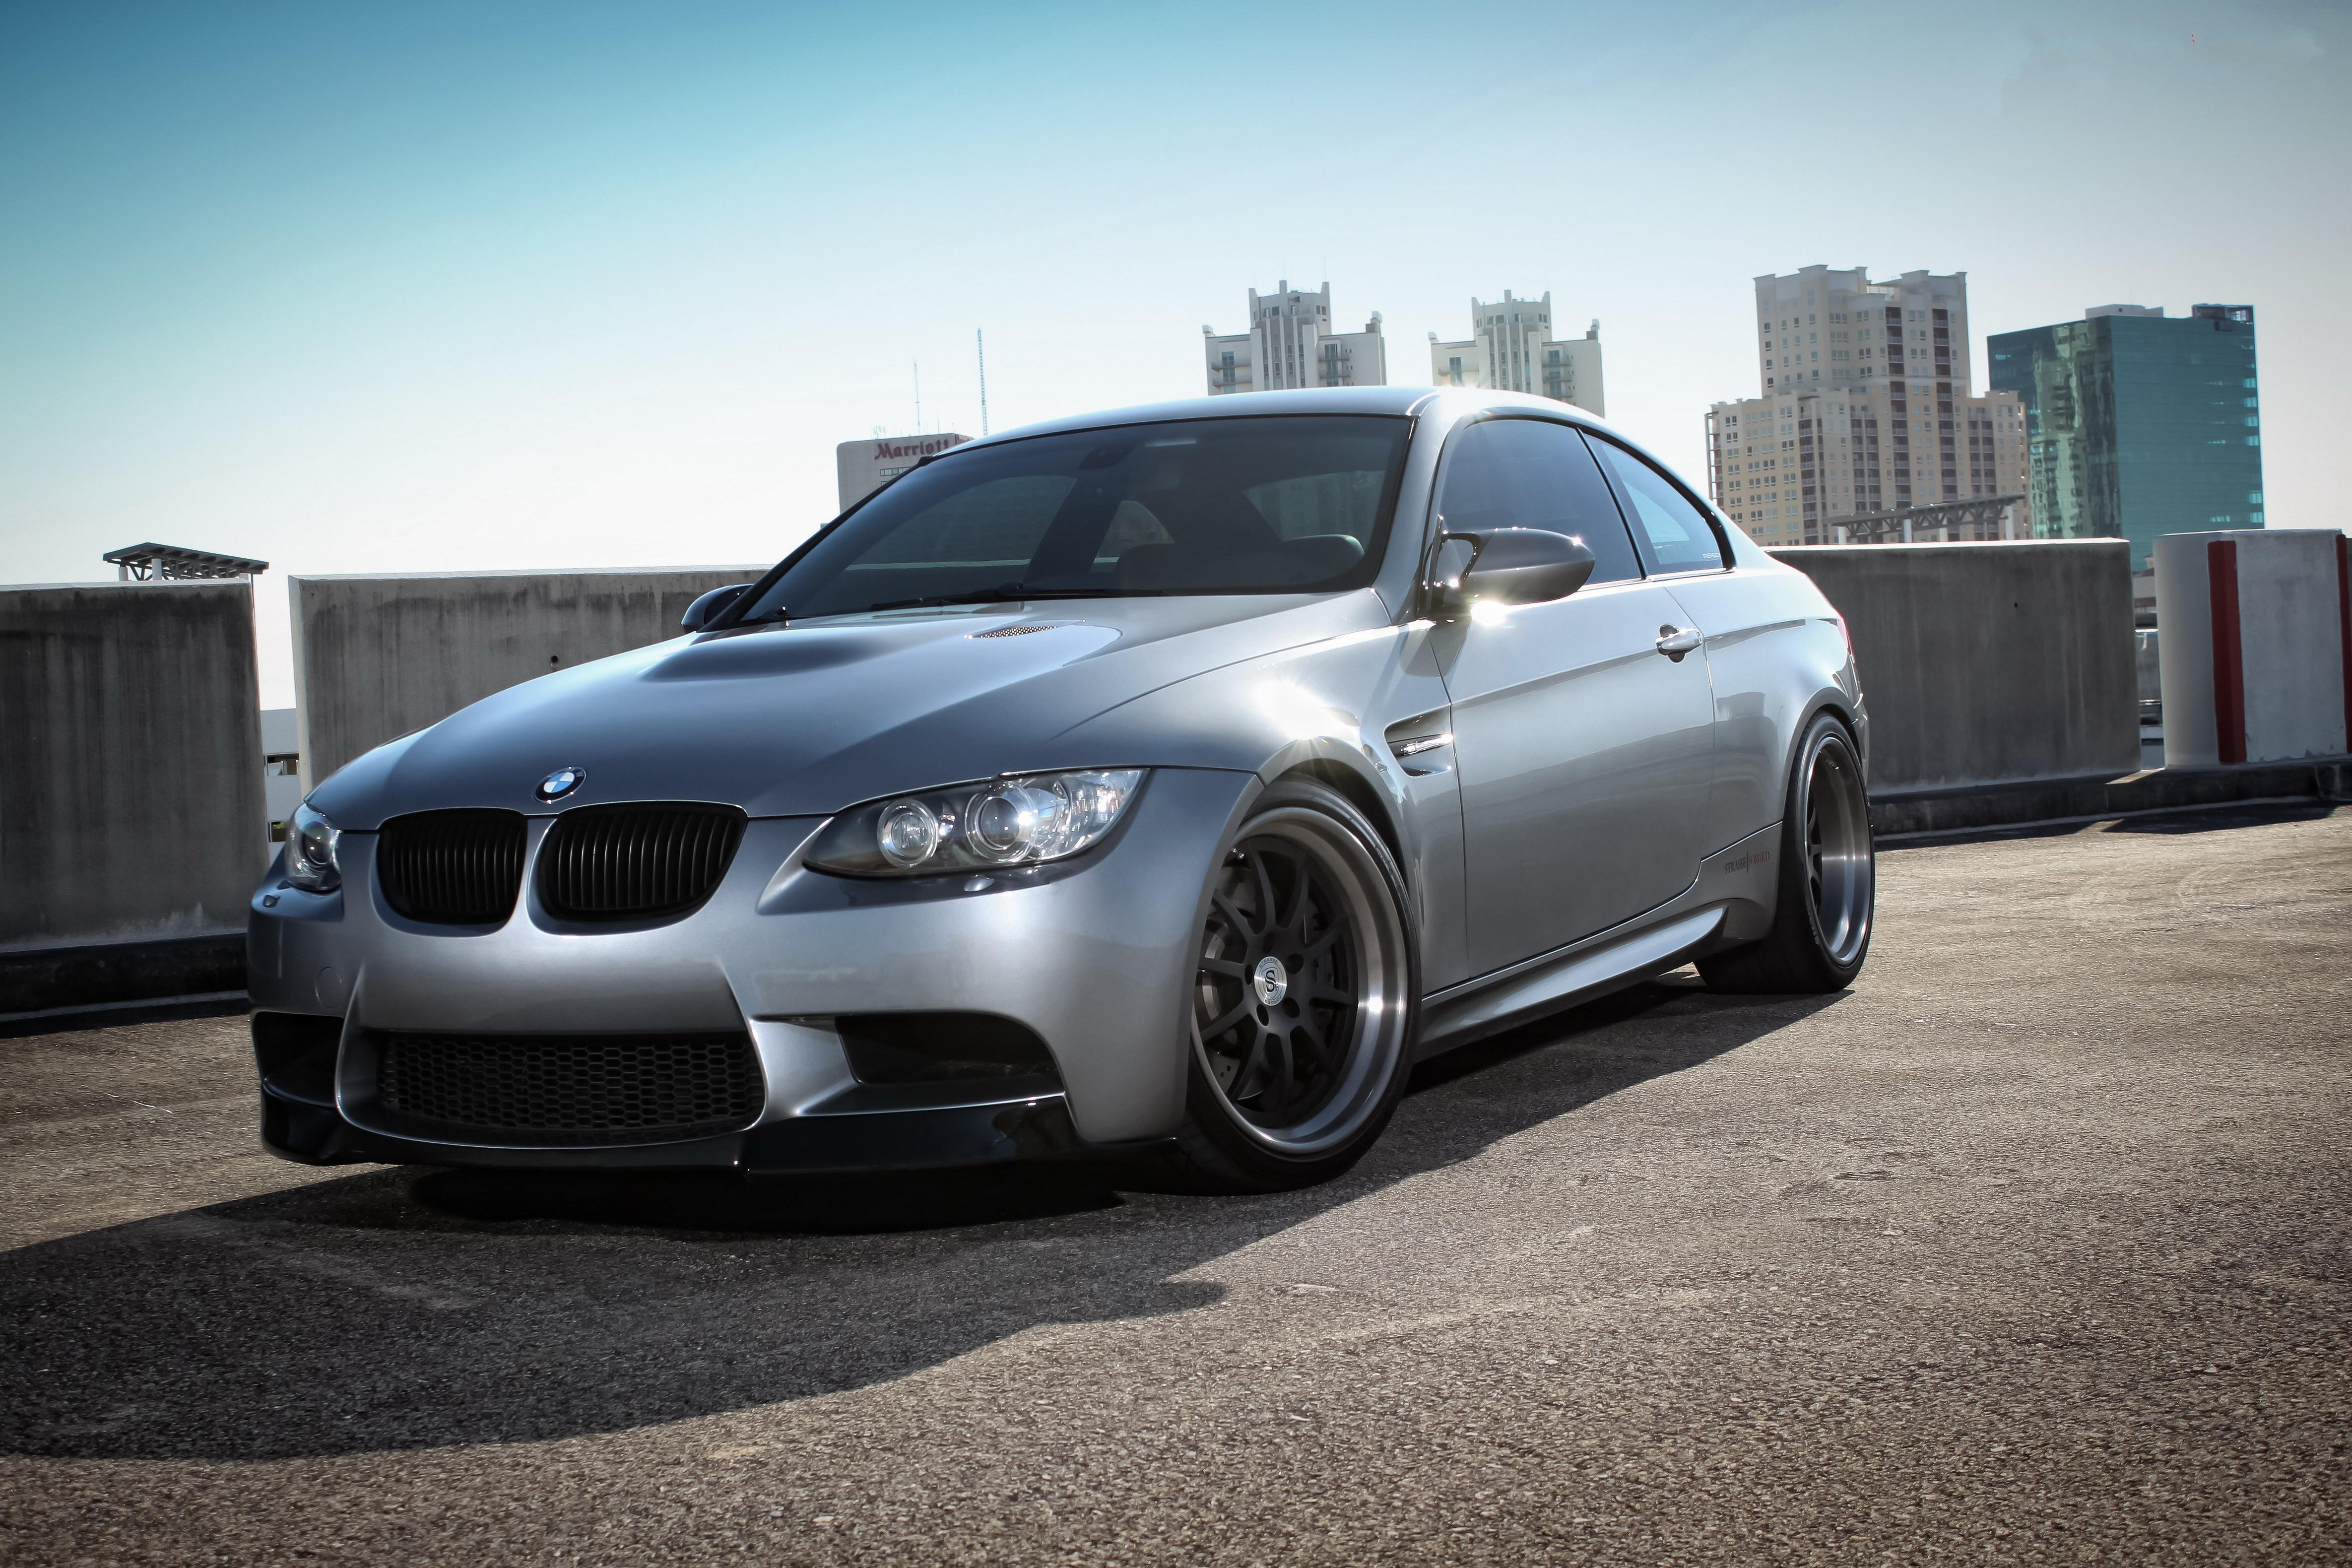 BMW M3 4k Ultra HD Wallpaper and Hintergrund | 4740x3160 ...